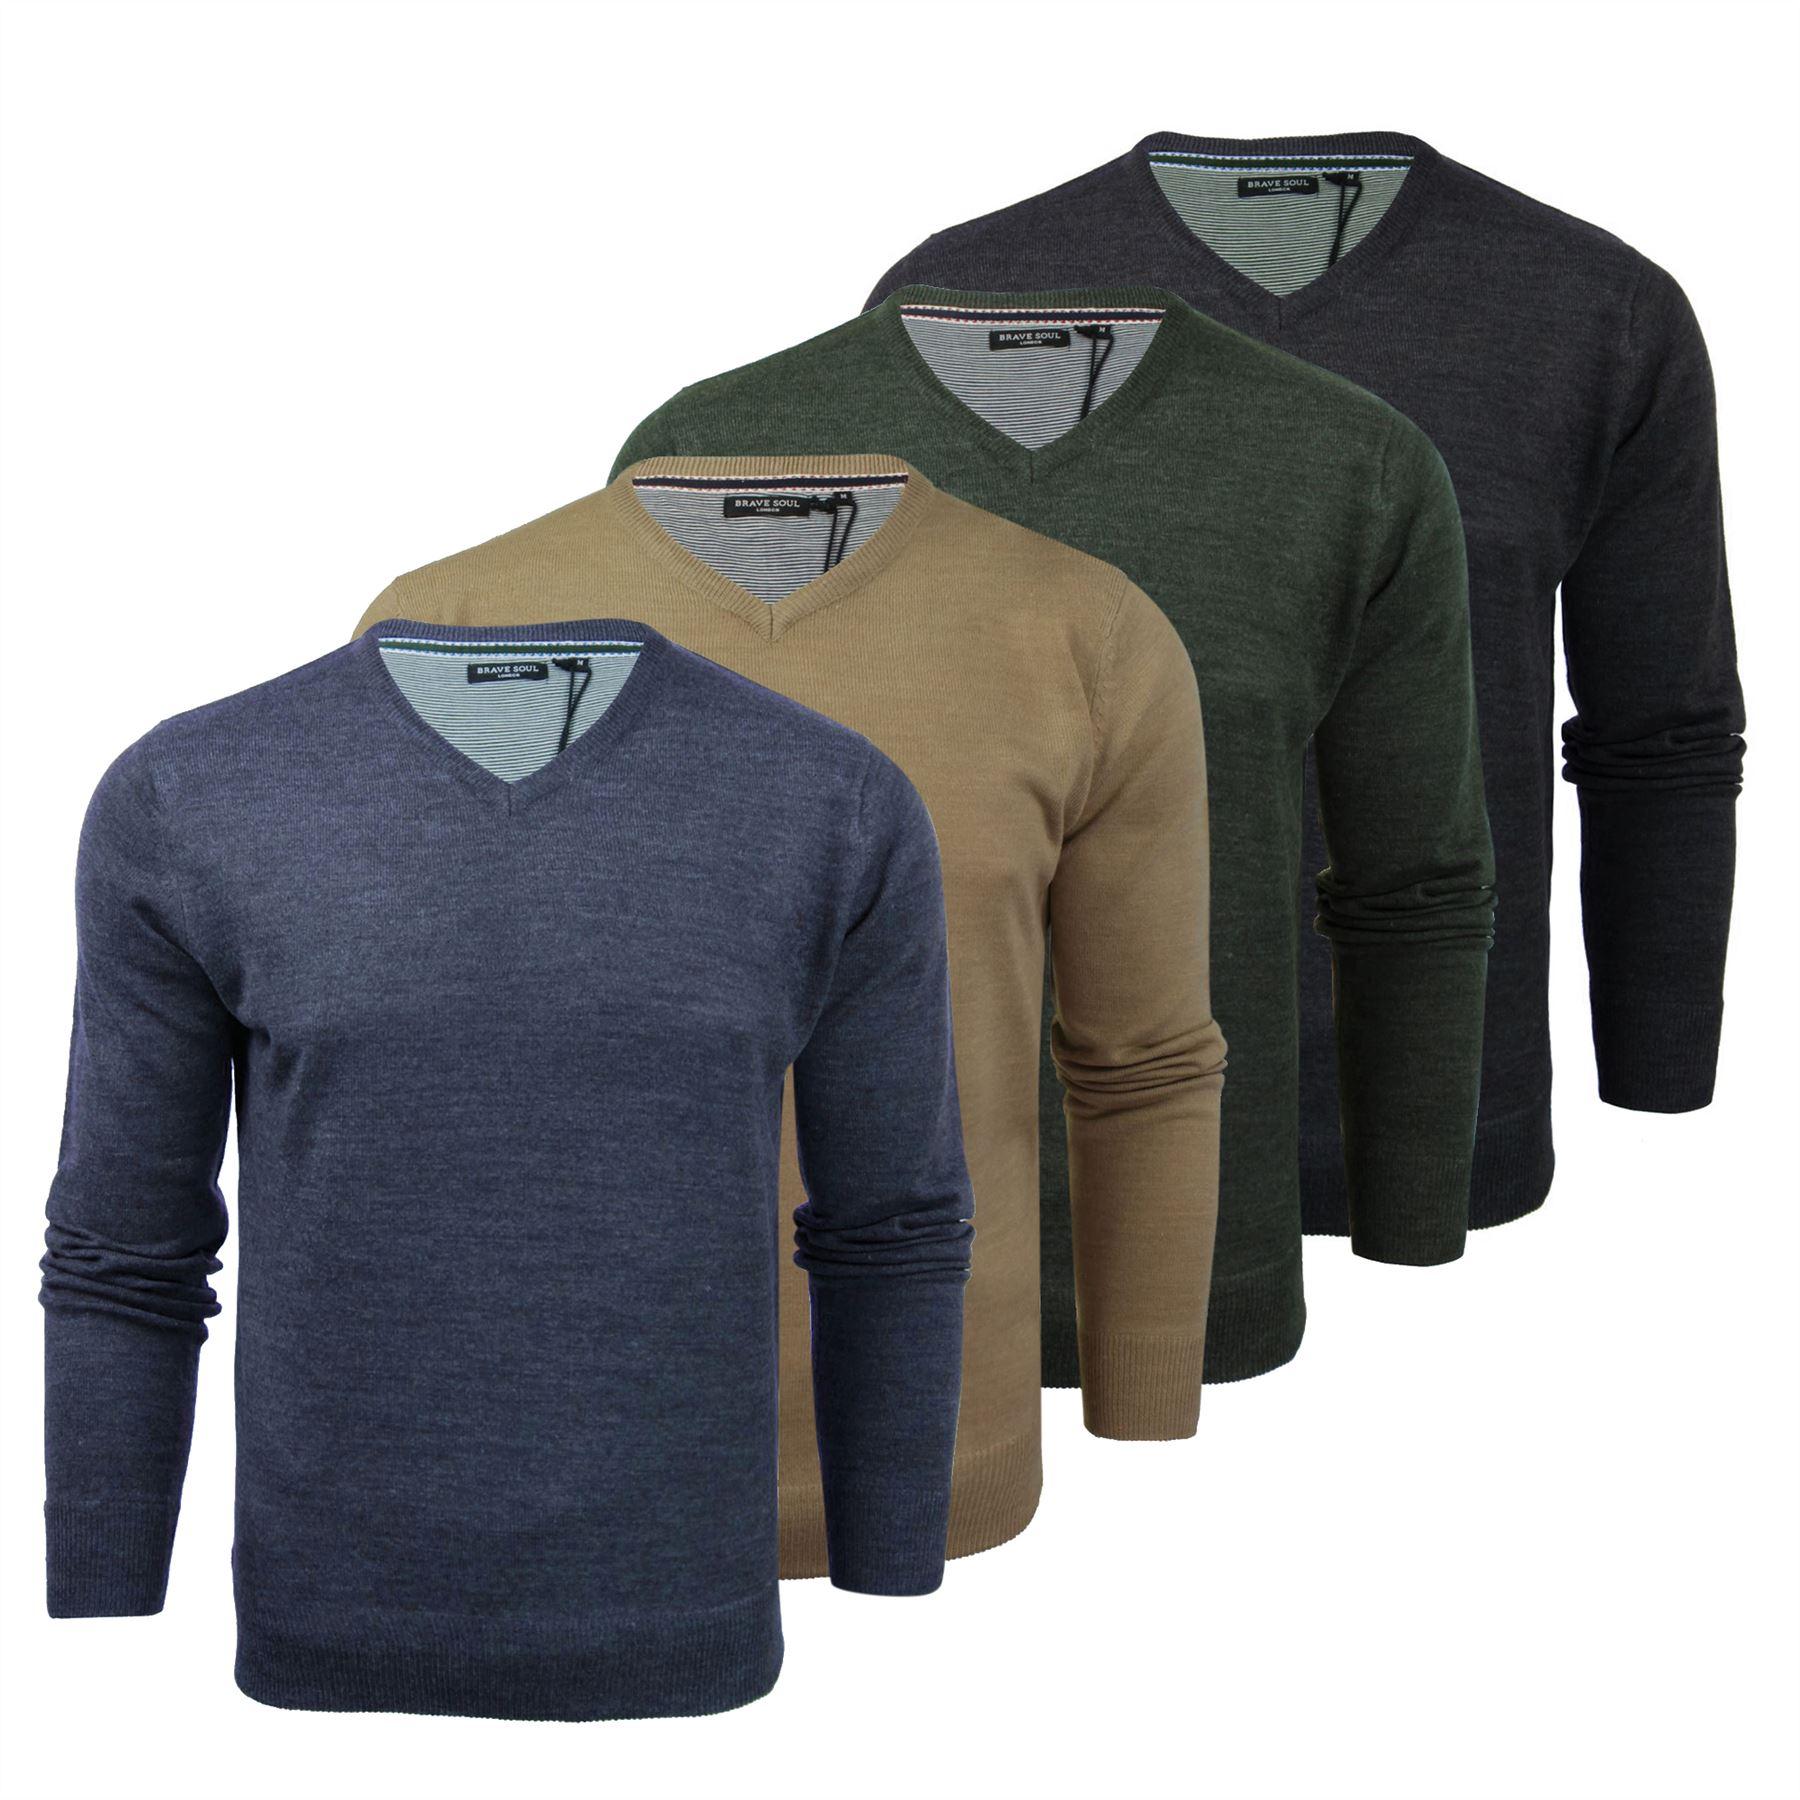 7b3a2e5691f86 Brave Soul Quazar Mens Jumper Knitted V Neck Sweater